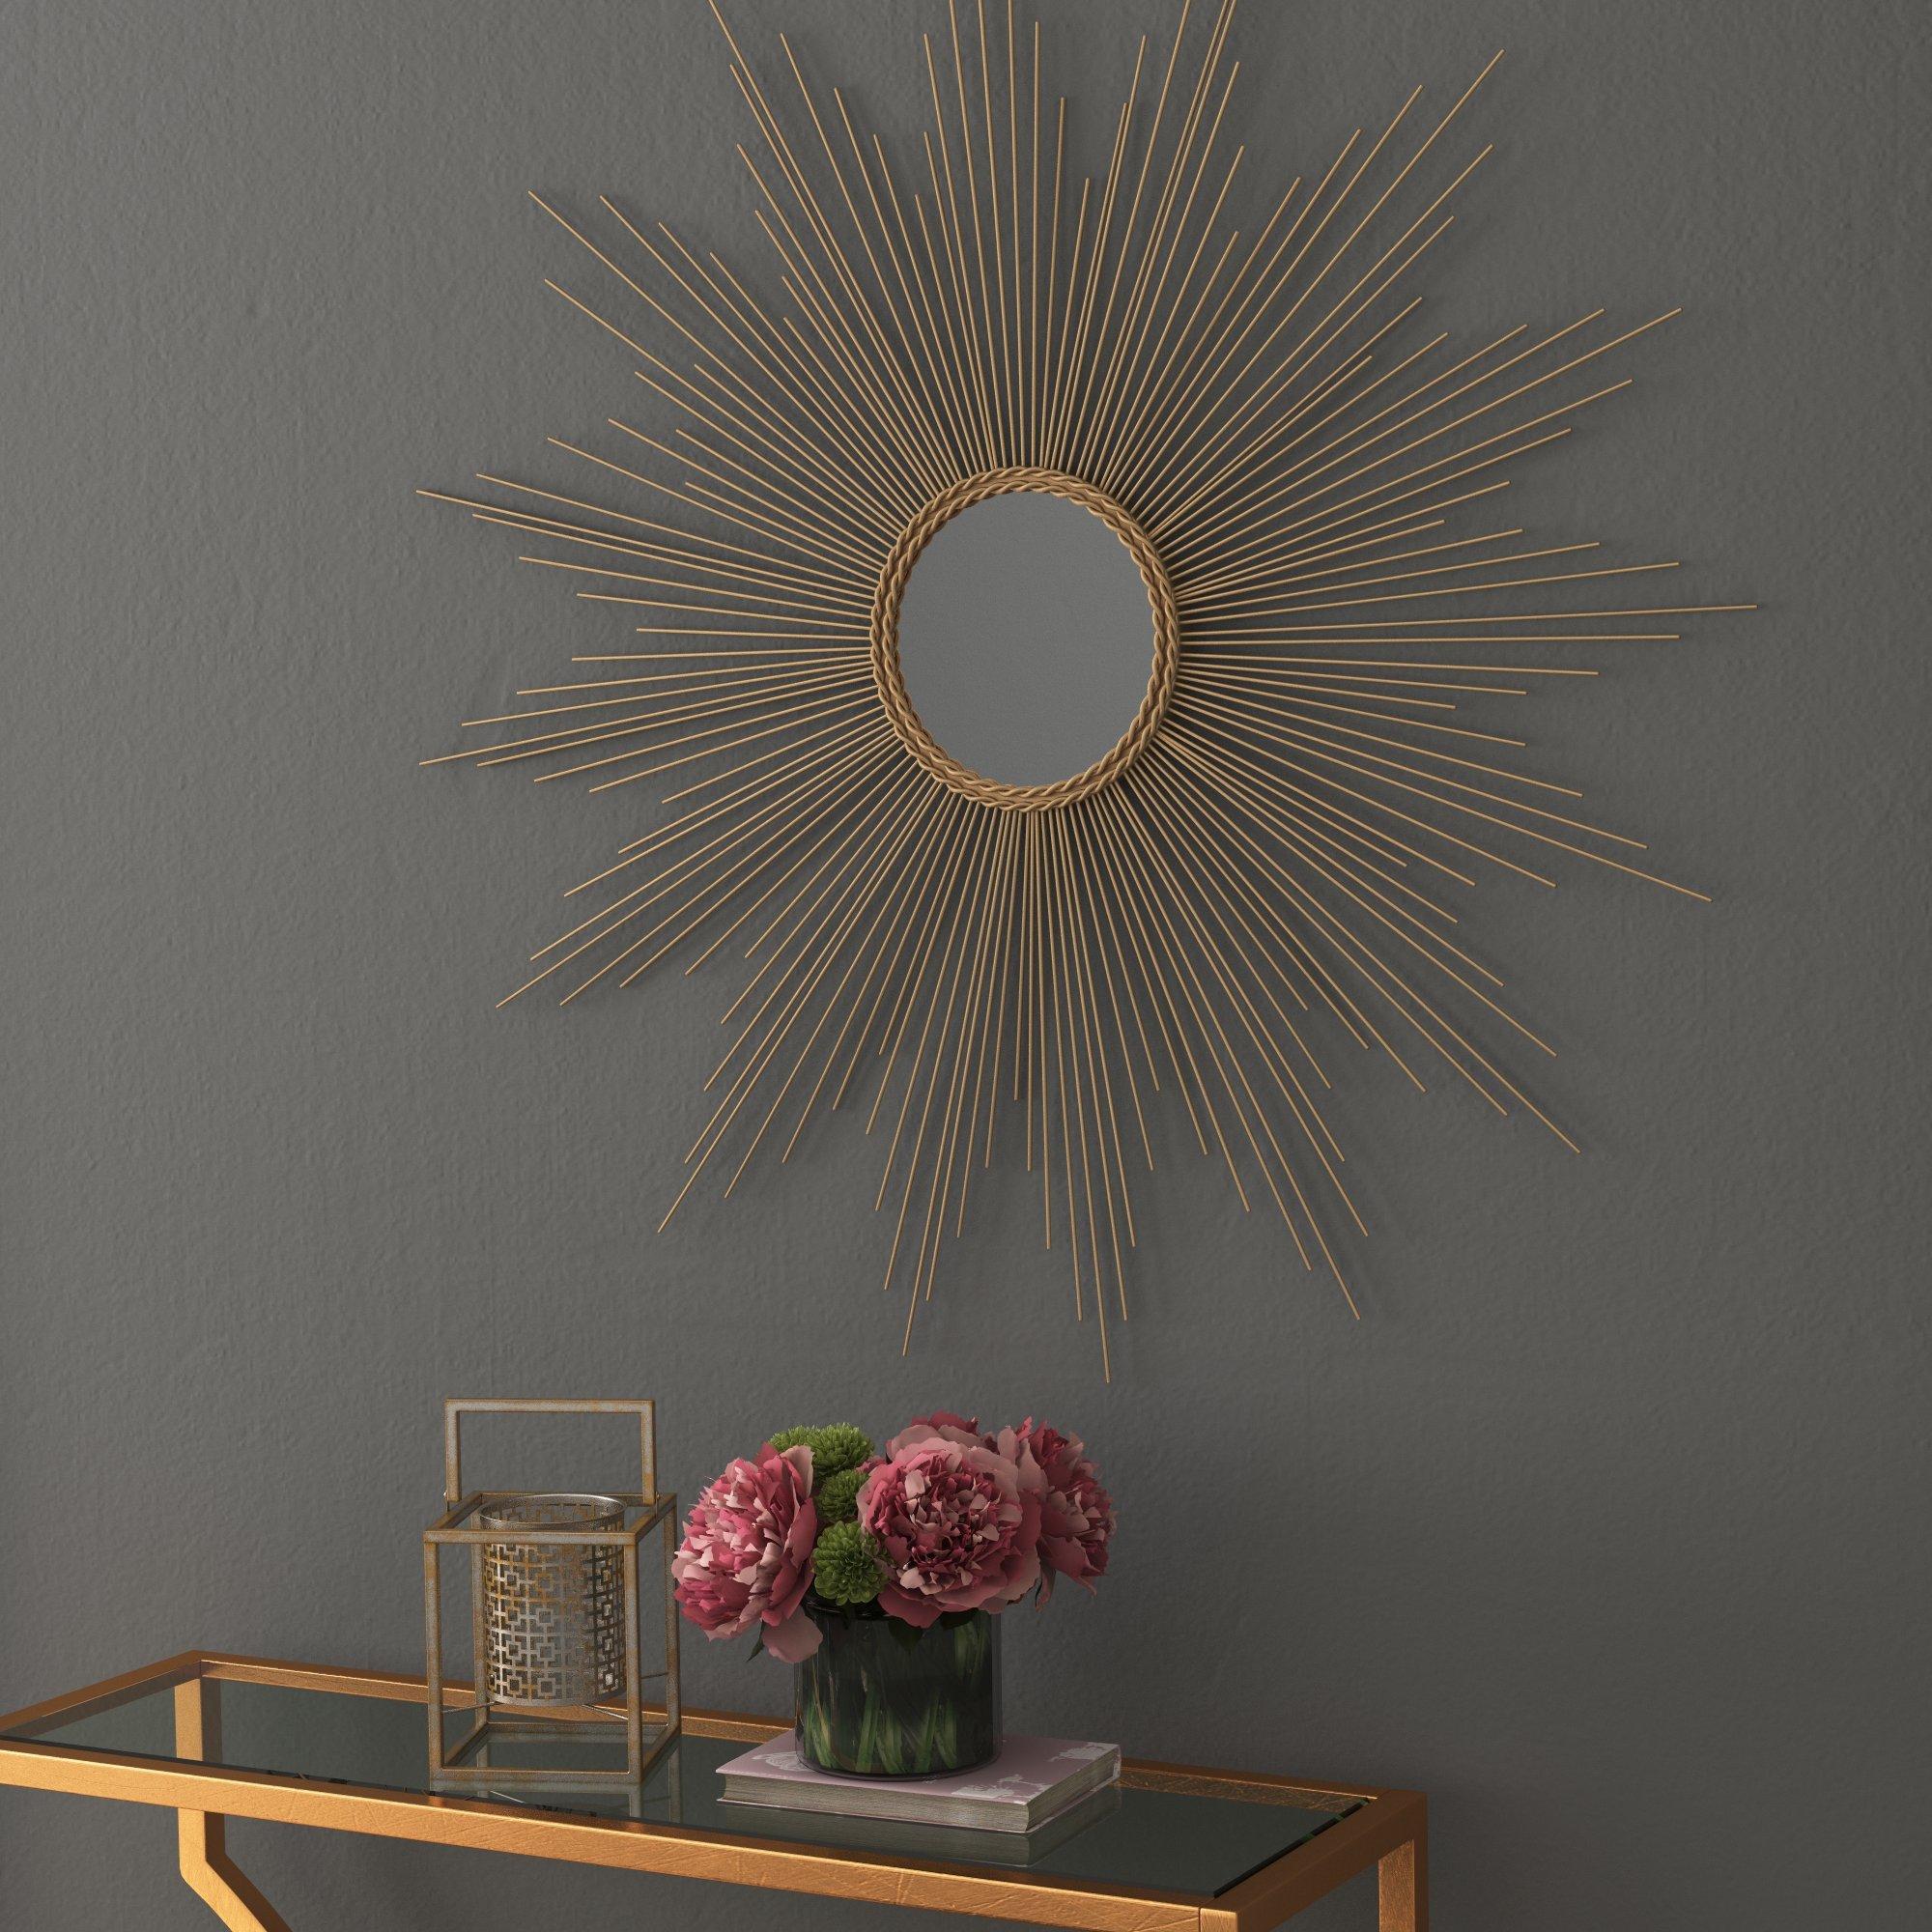 Modern Sunburst Mirrors | Allmodern With Regard To Jarrod Sunburst Accent Mirrors (Image 15 of 20)